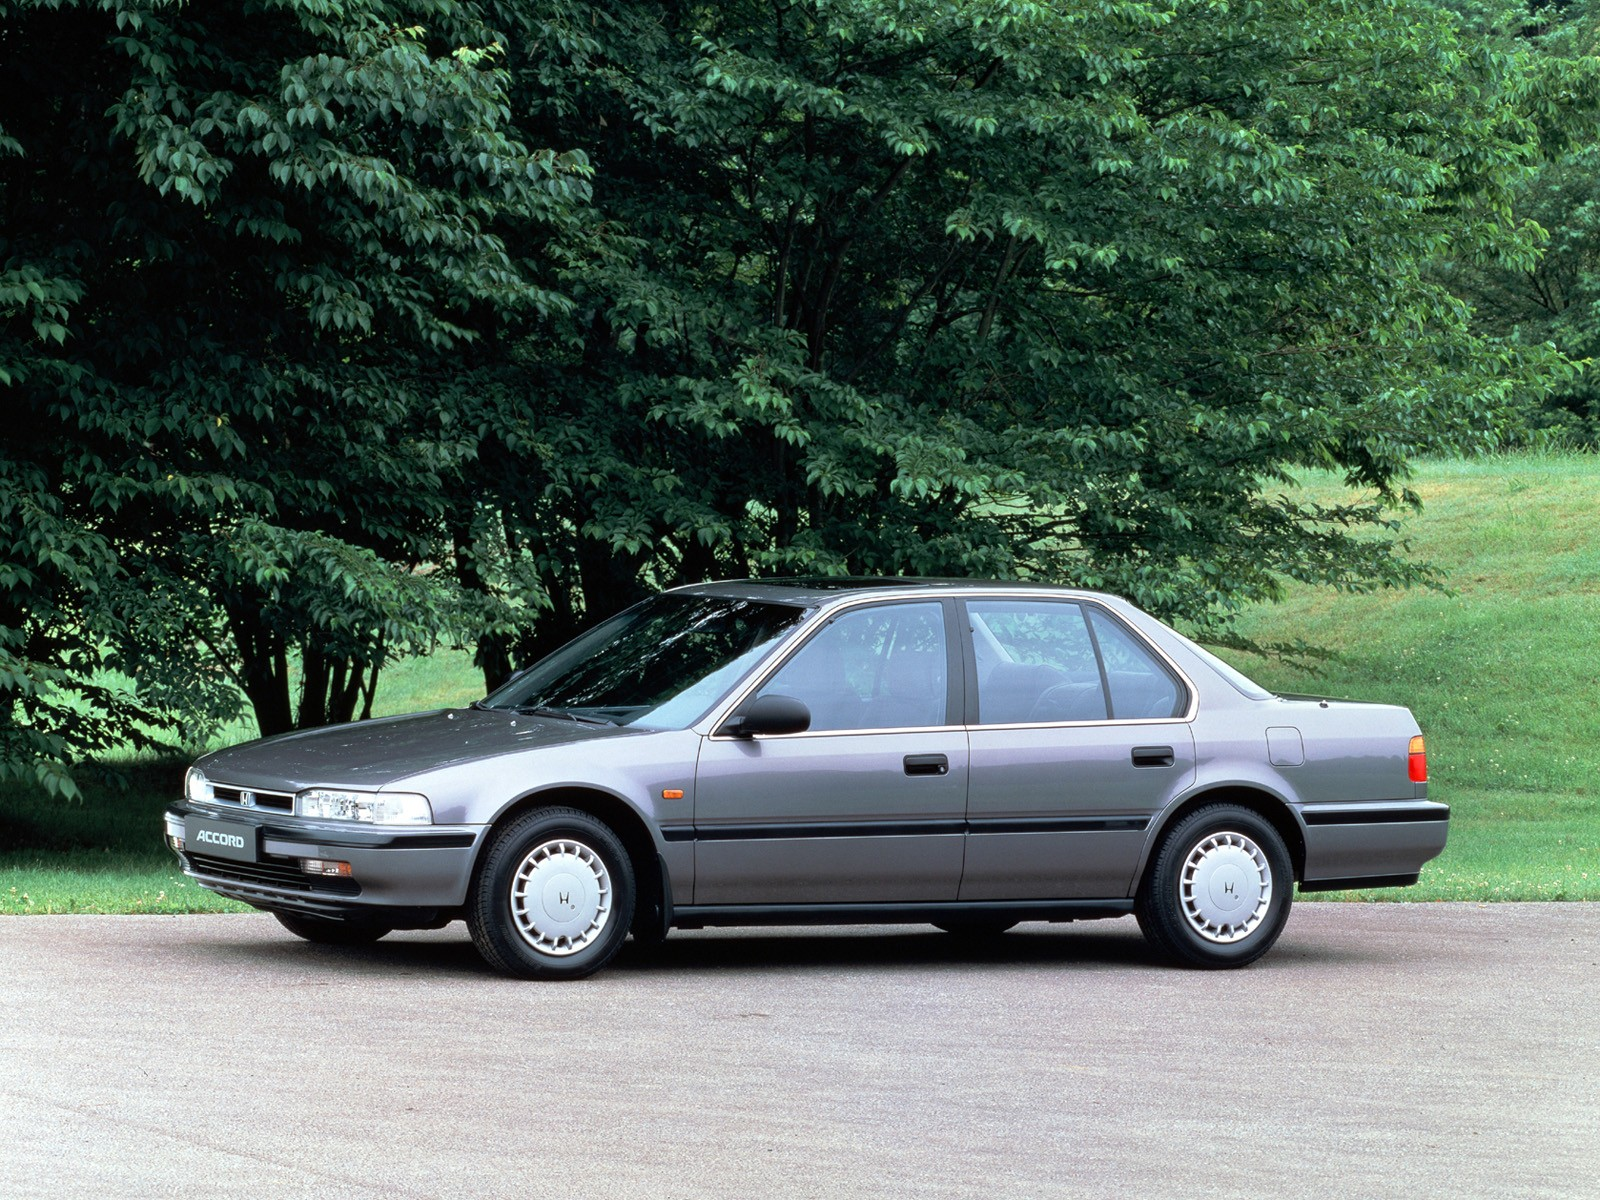 Honda Accord Iv 1989 1993 Station Wagon 5 Door Outstanding Cars 1999 4 3